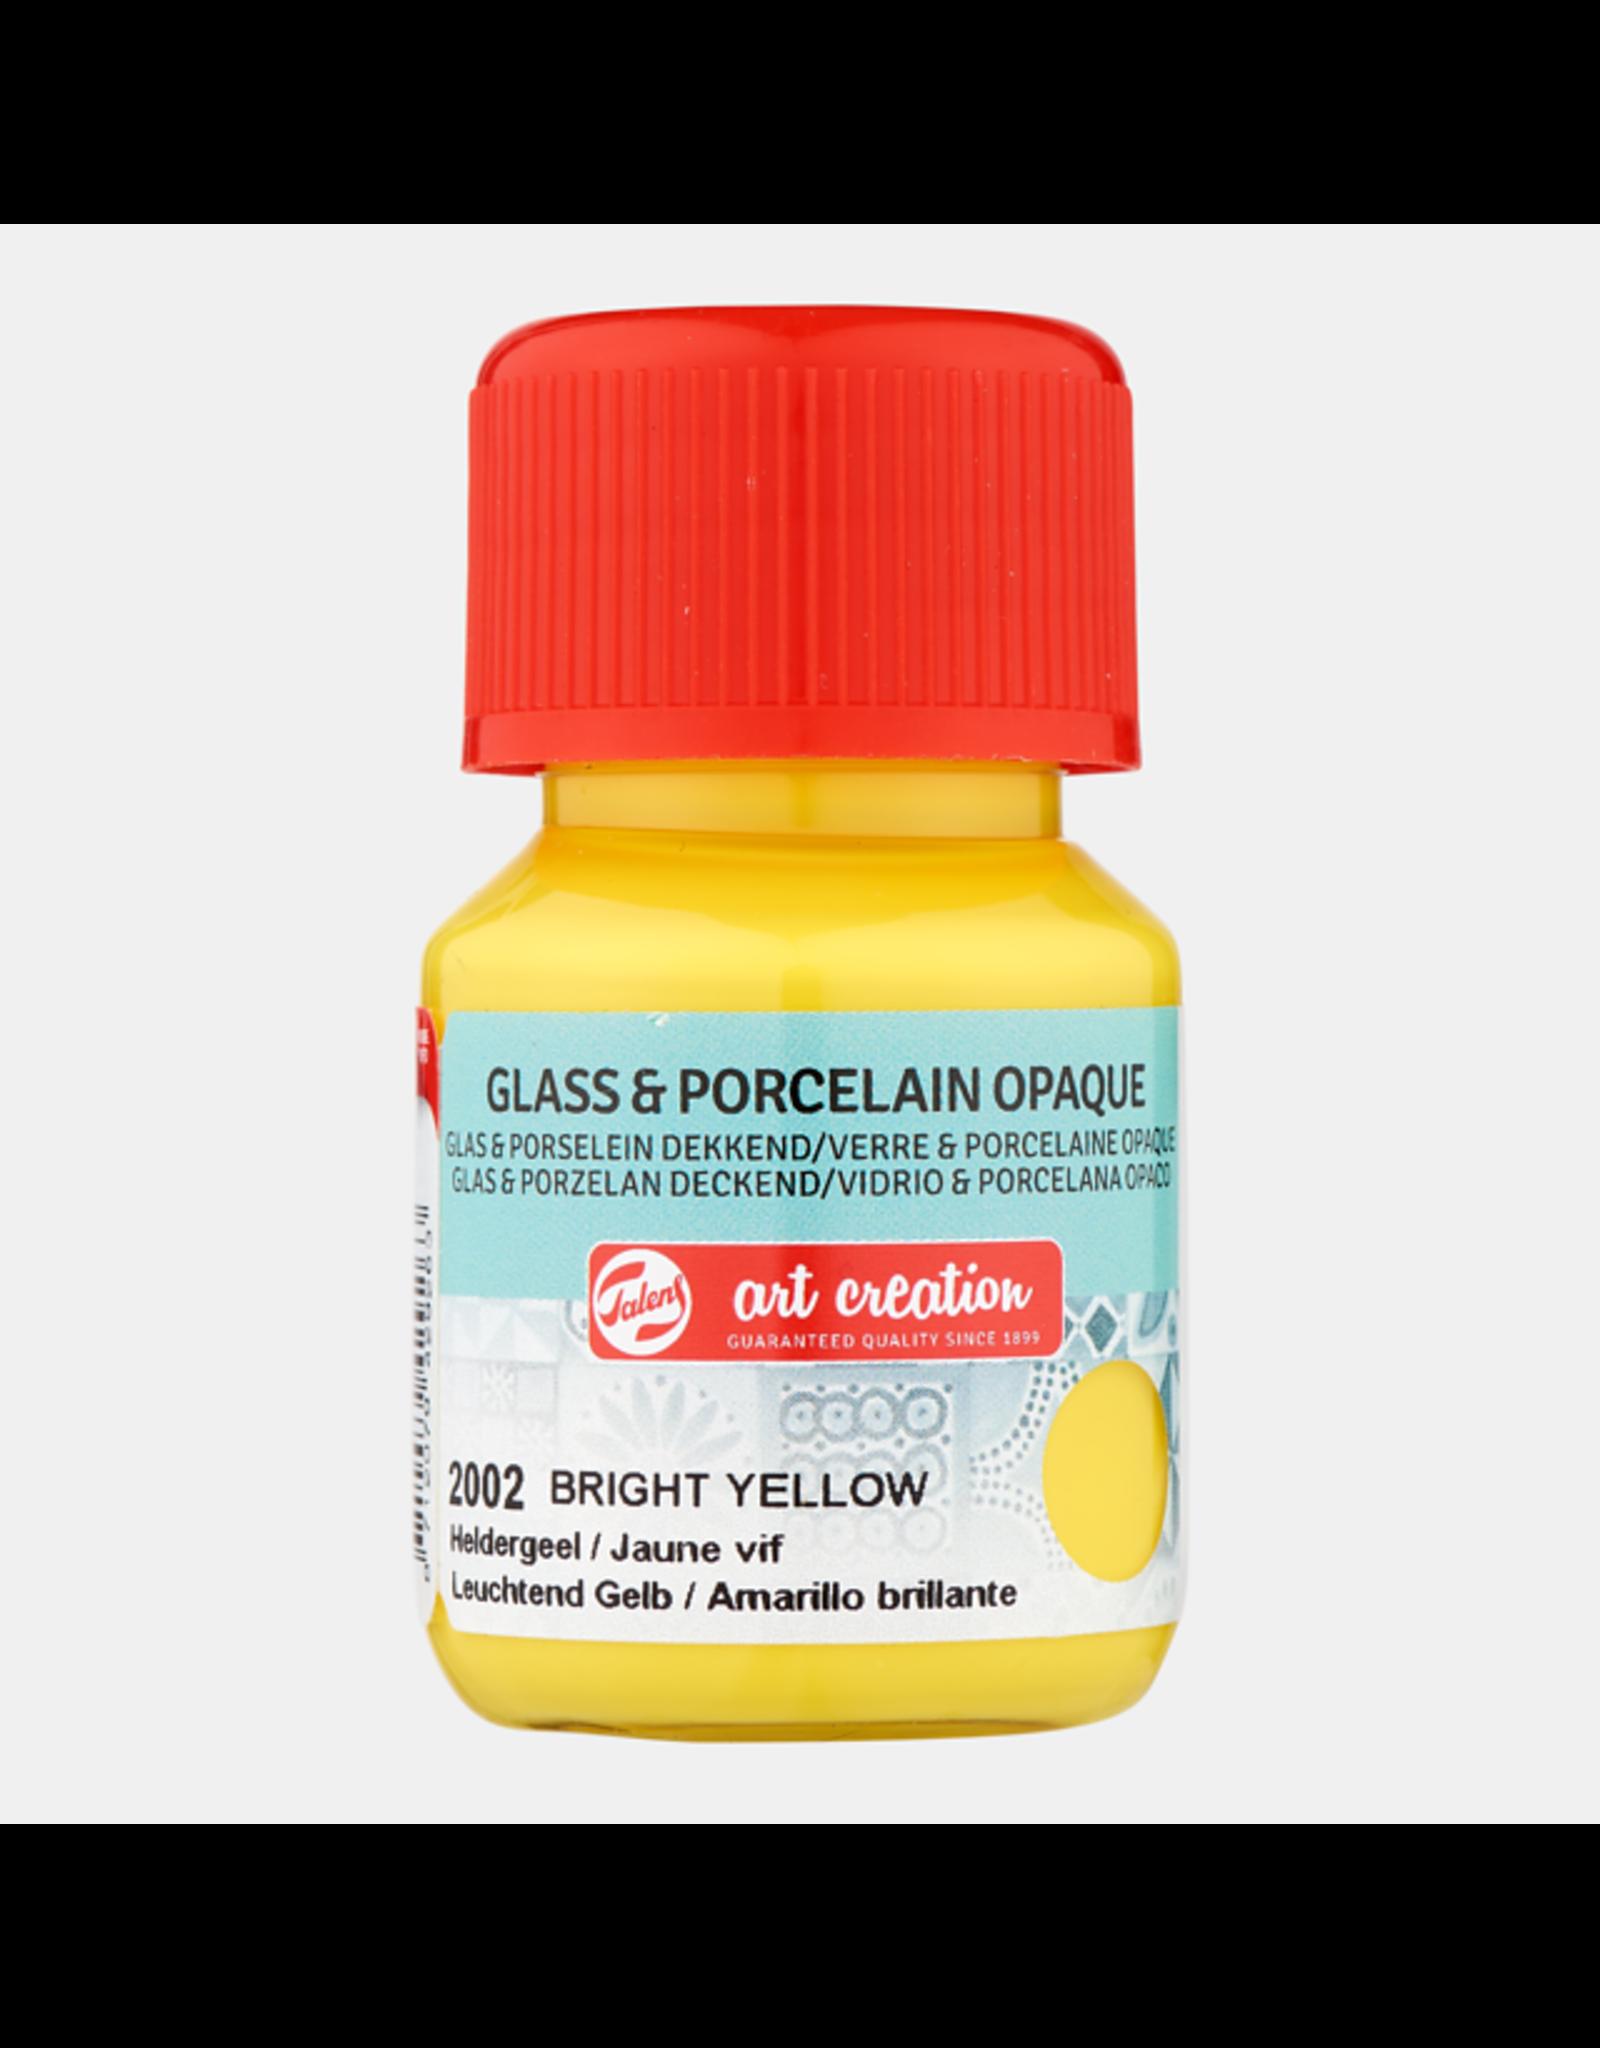 Art creation Heldergeel  - Glass & Porcelain Opaque - 30 ml